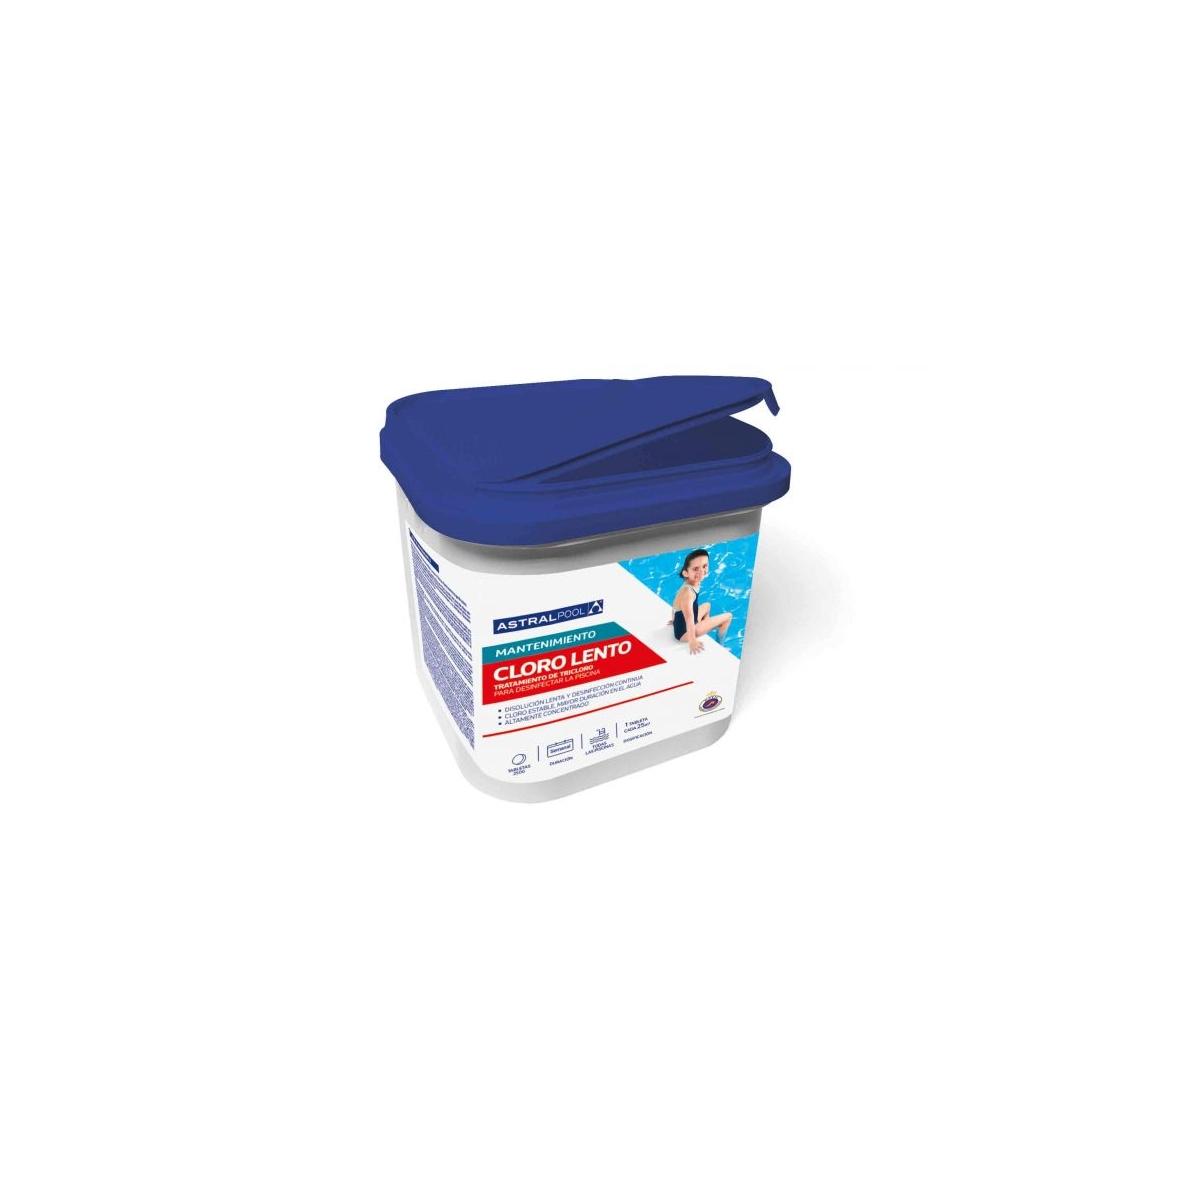 Thrichlorine tablets 5 kg (Minimum purchase 20kg)